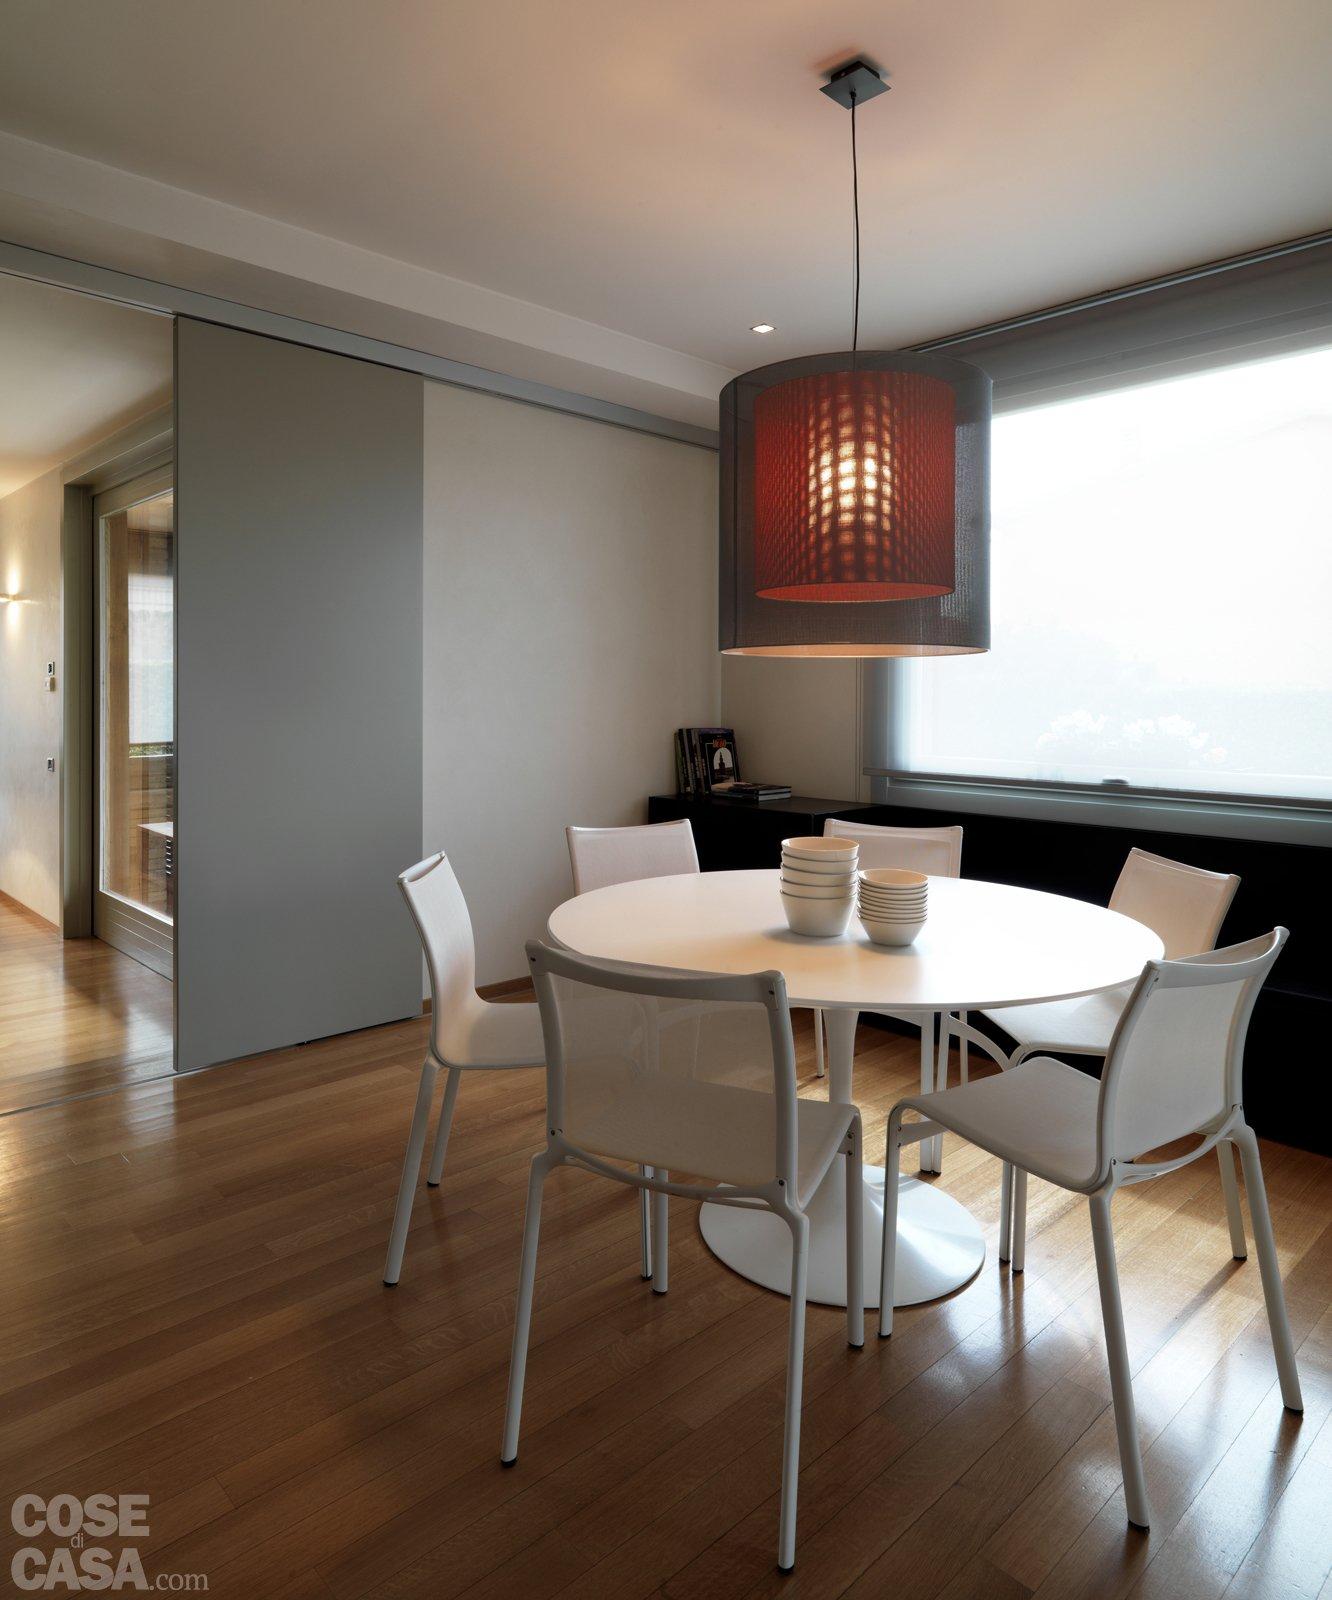 Arredata Con Pezzi Di Design E Finiture Di Tendenza Cose Di Casa #3F2C1F 1332 1600 Immagini Di Cucine Americane